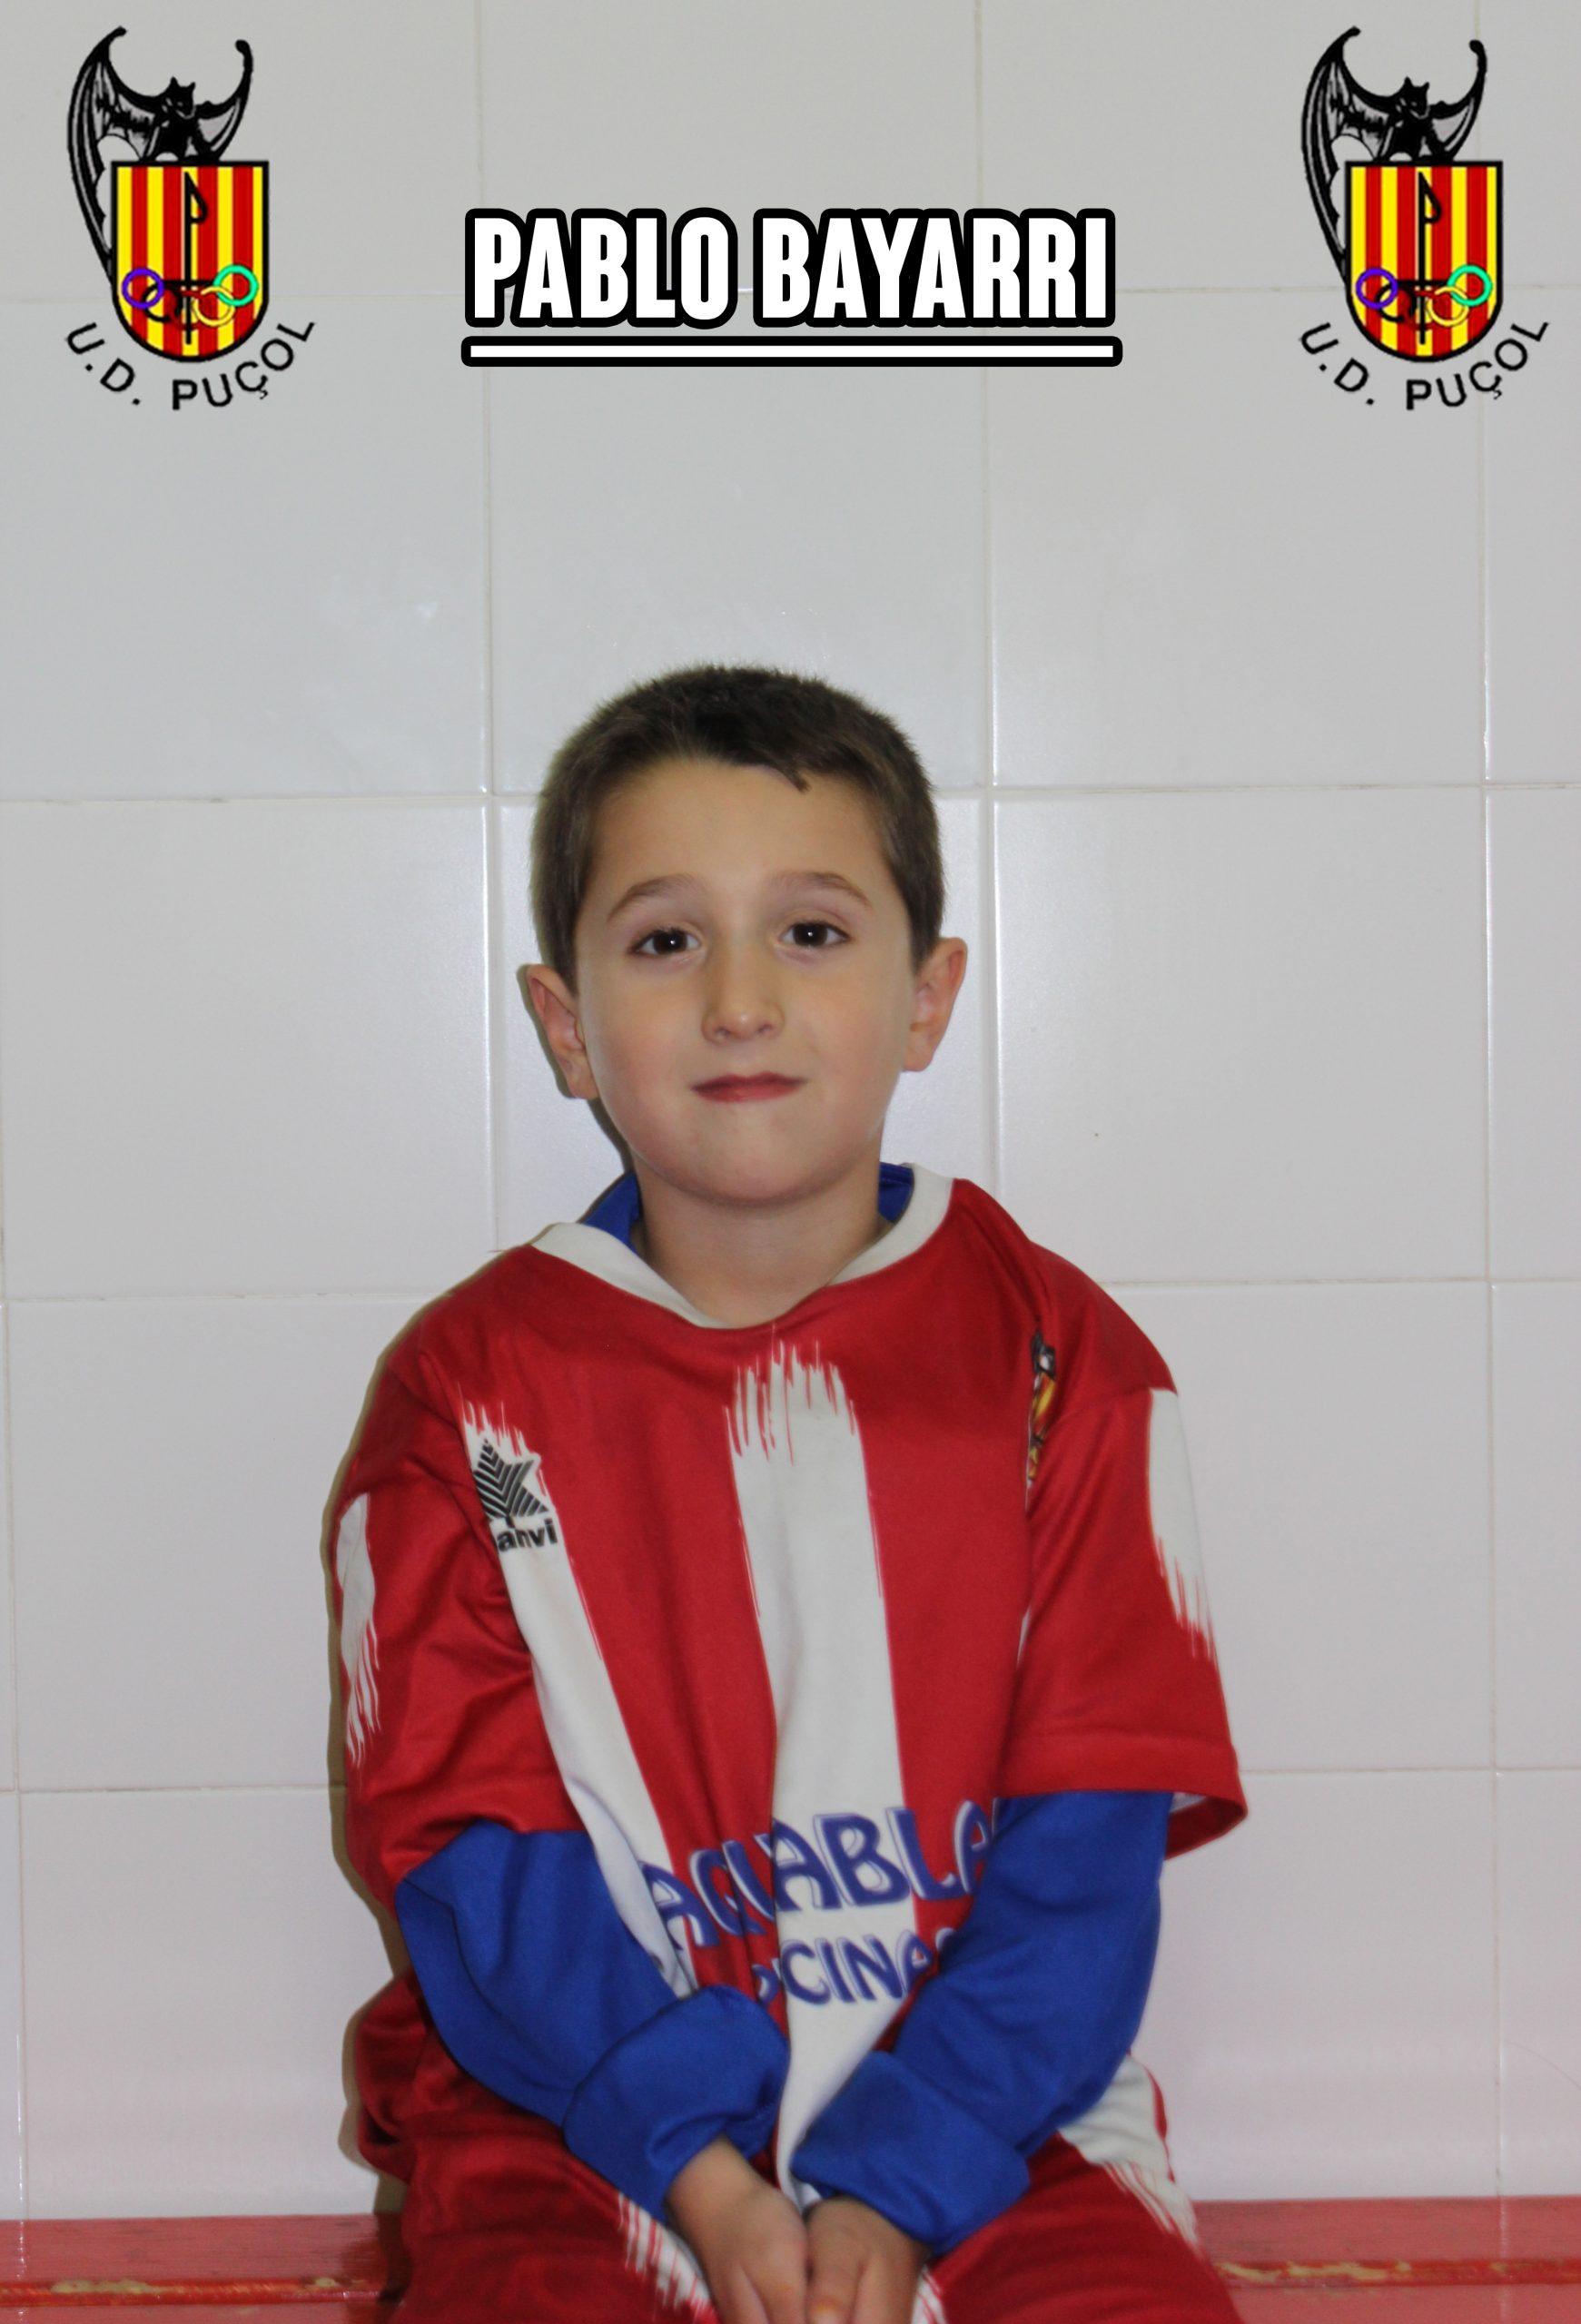 Pablo Bayarri